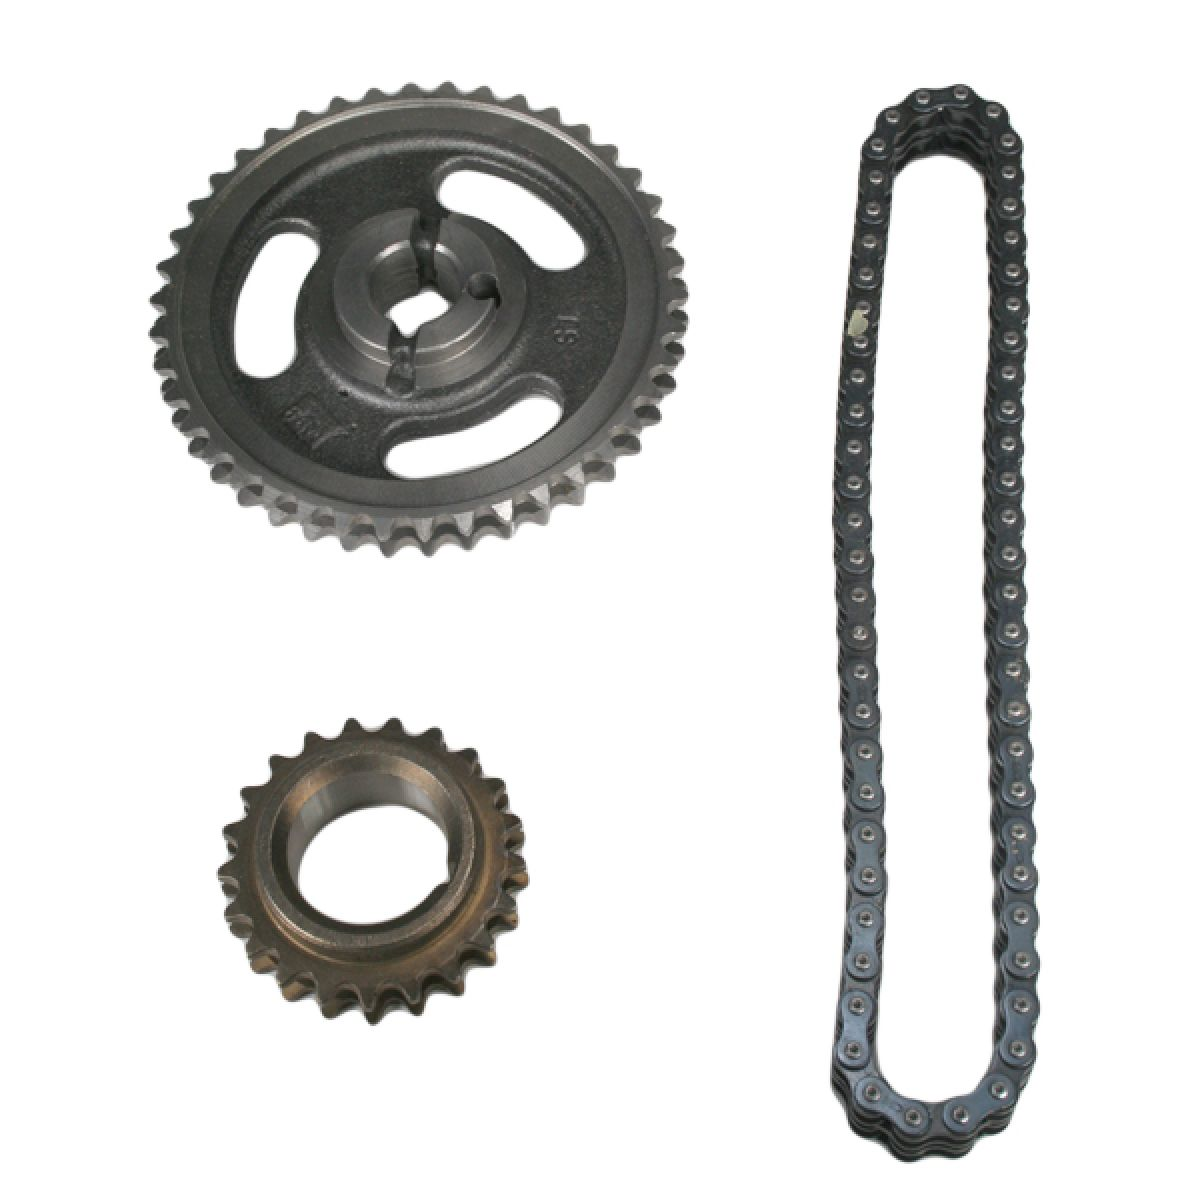 Roller Timing Chain Set Kit For Ford Lincoln Mercury V8